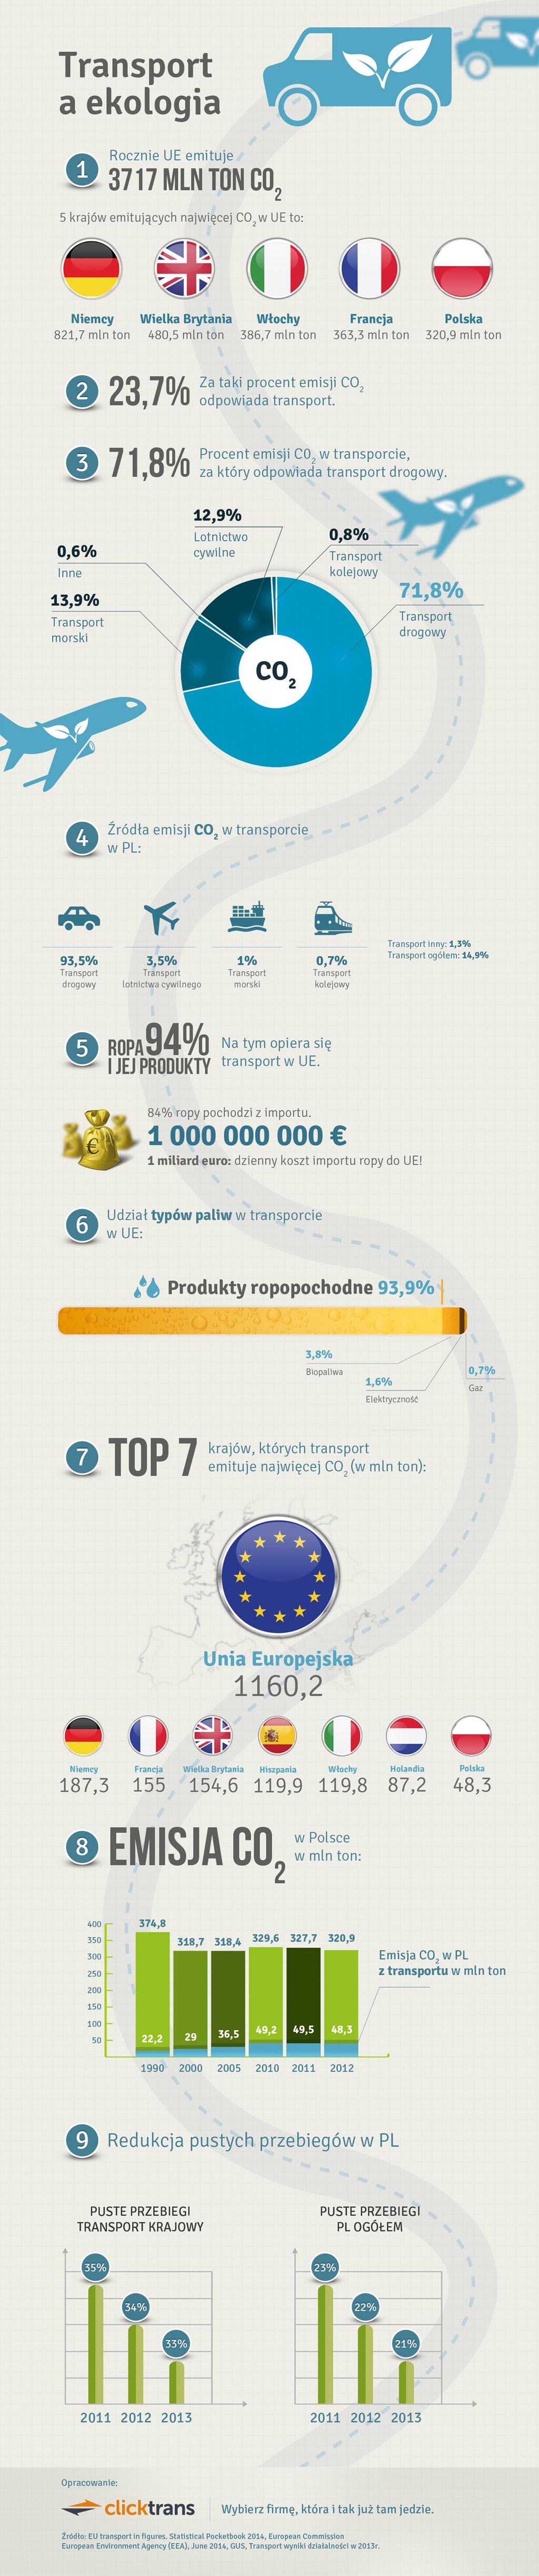 Ekologia_transport_infografika-1